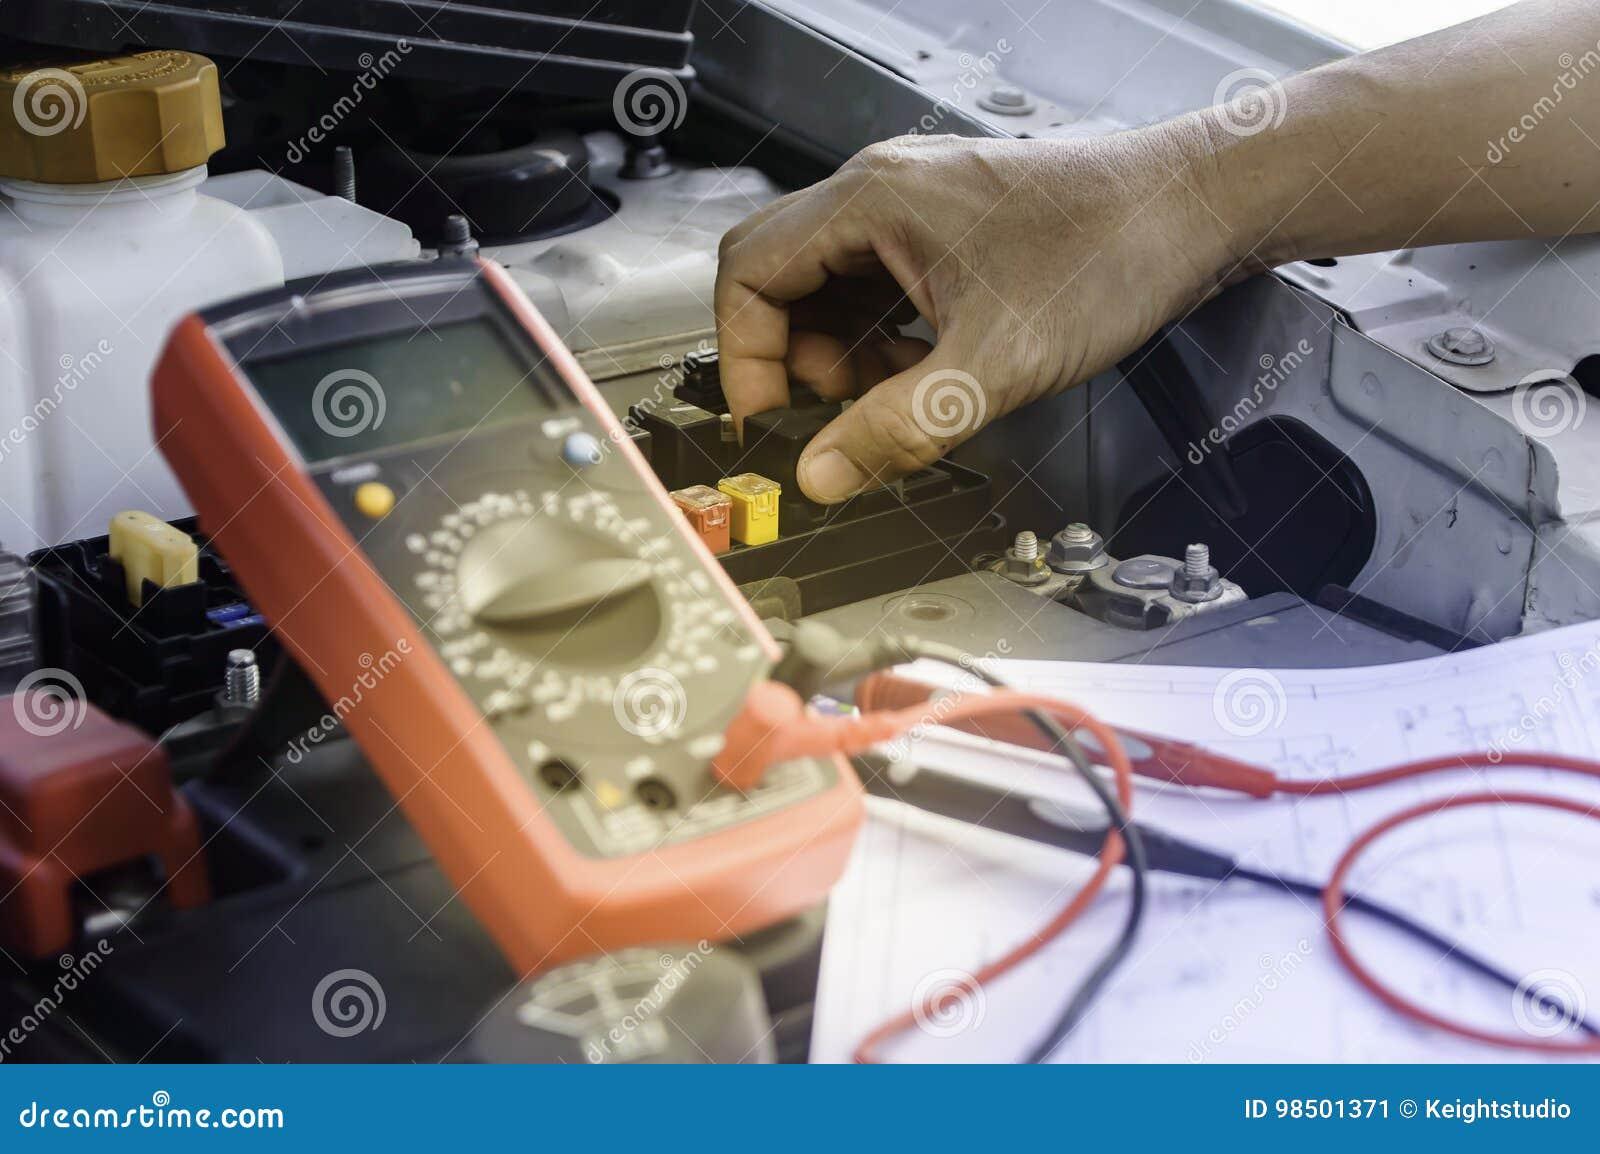 Auto mechanic uses a multimeter voltmeter.